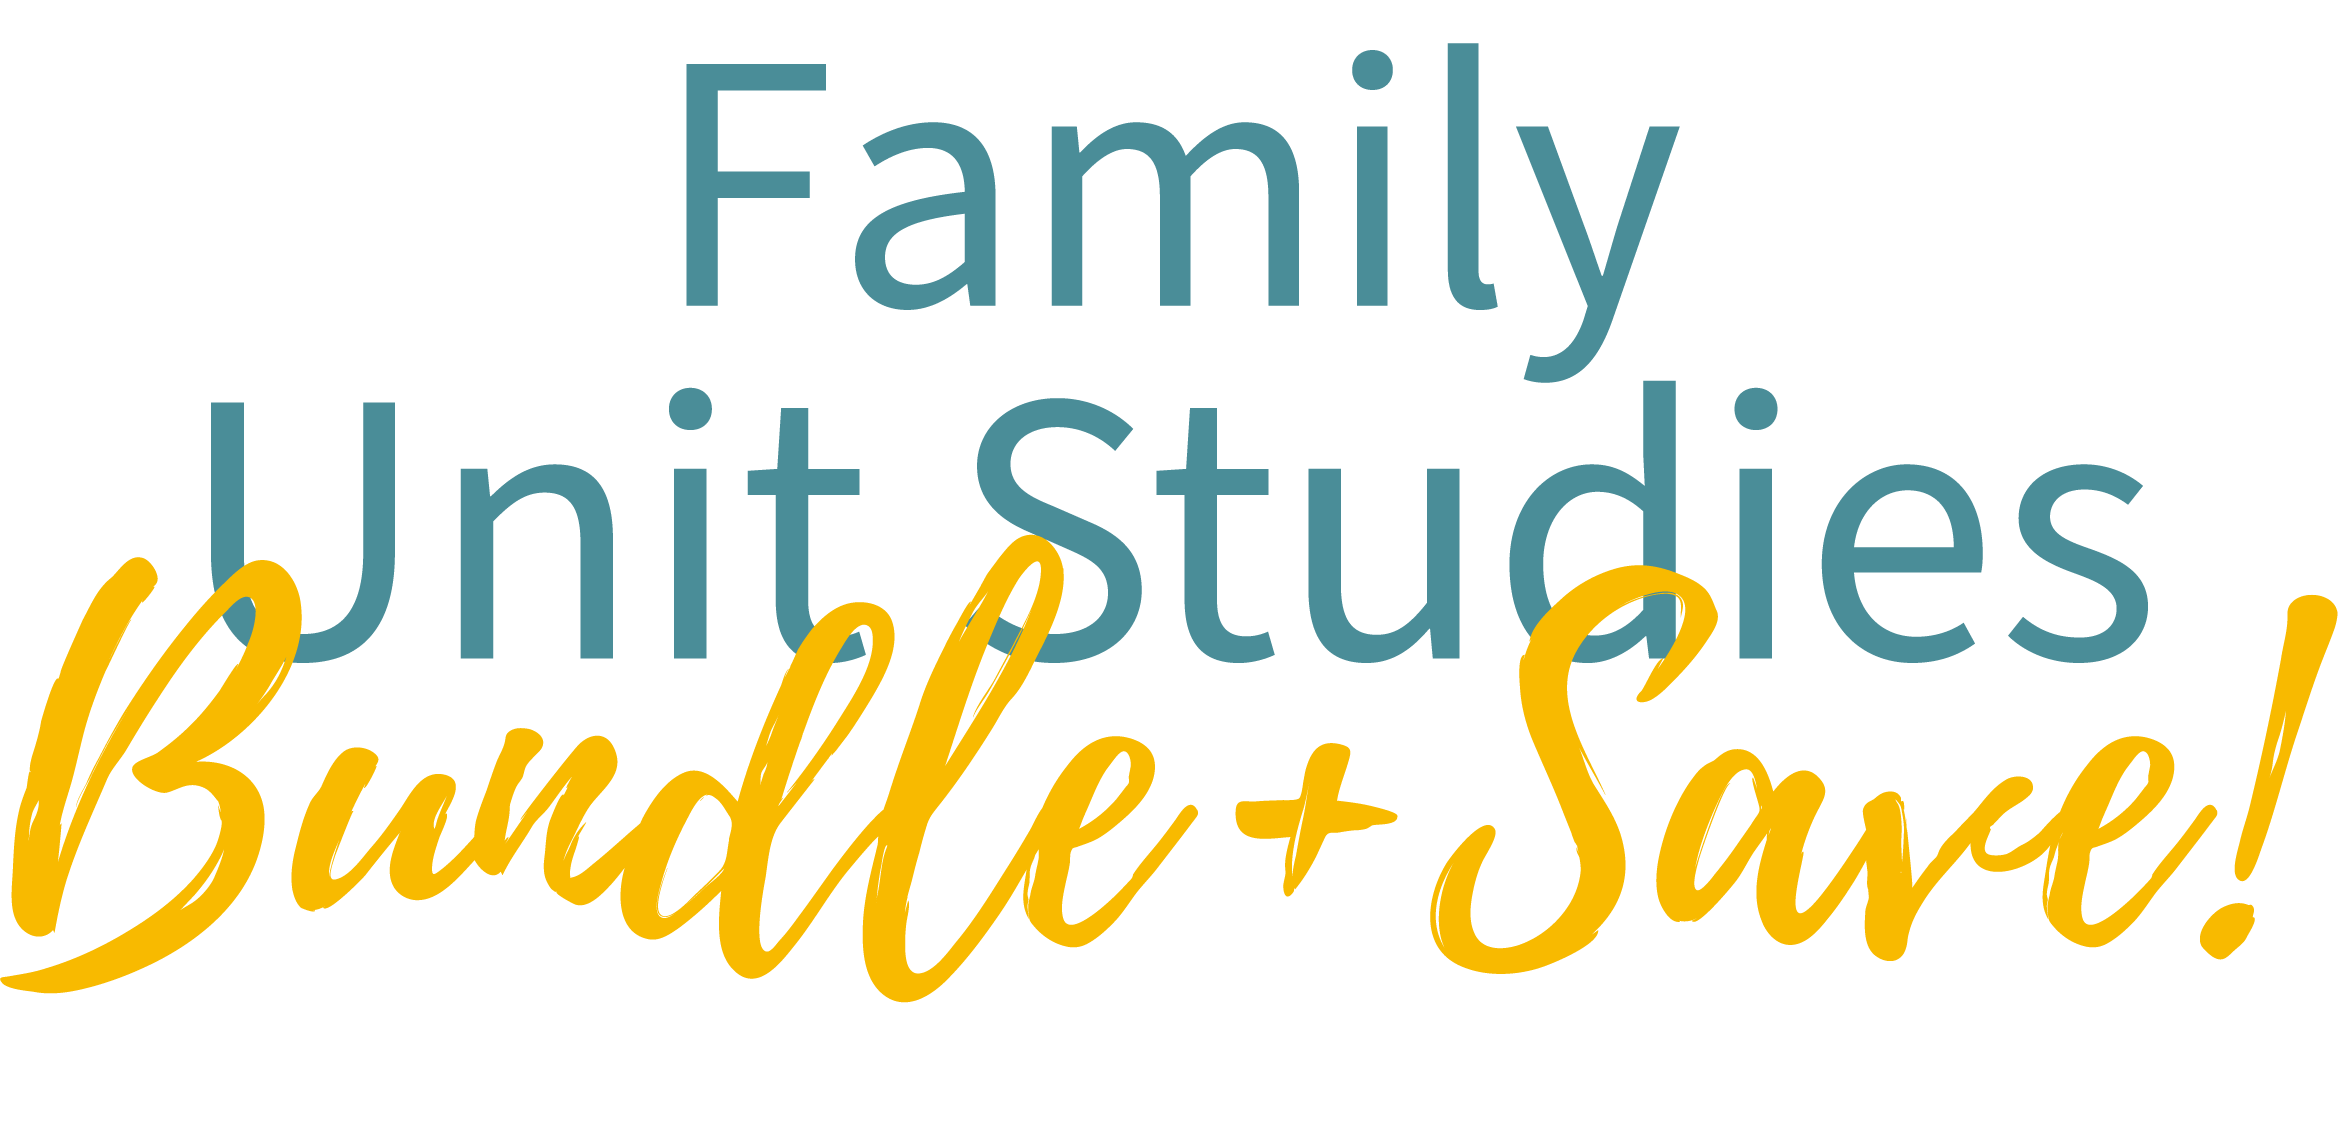 Family Unit Studies Bundle and Save!